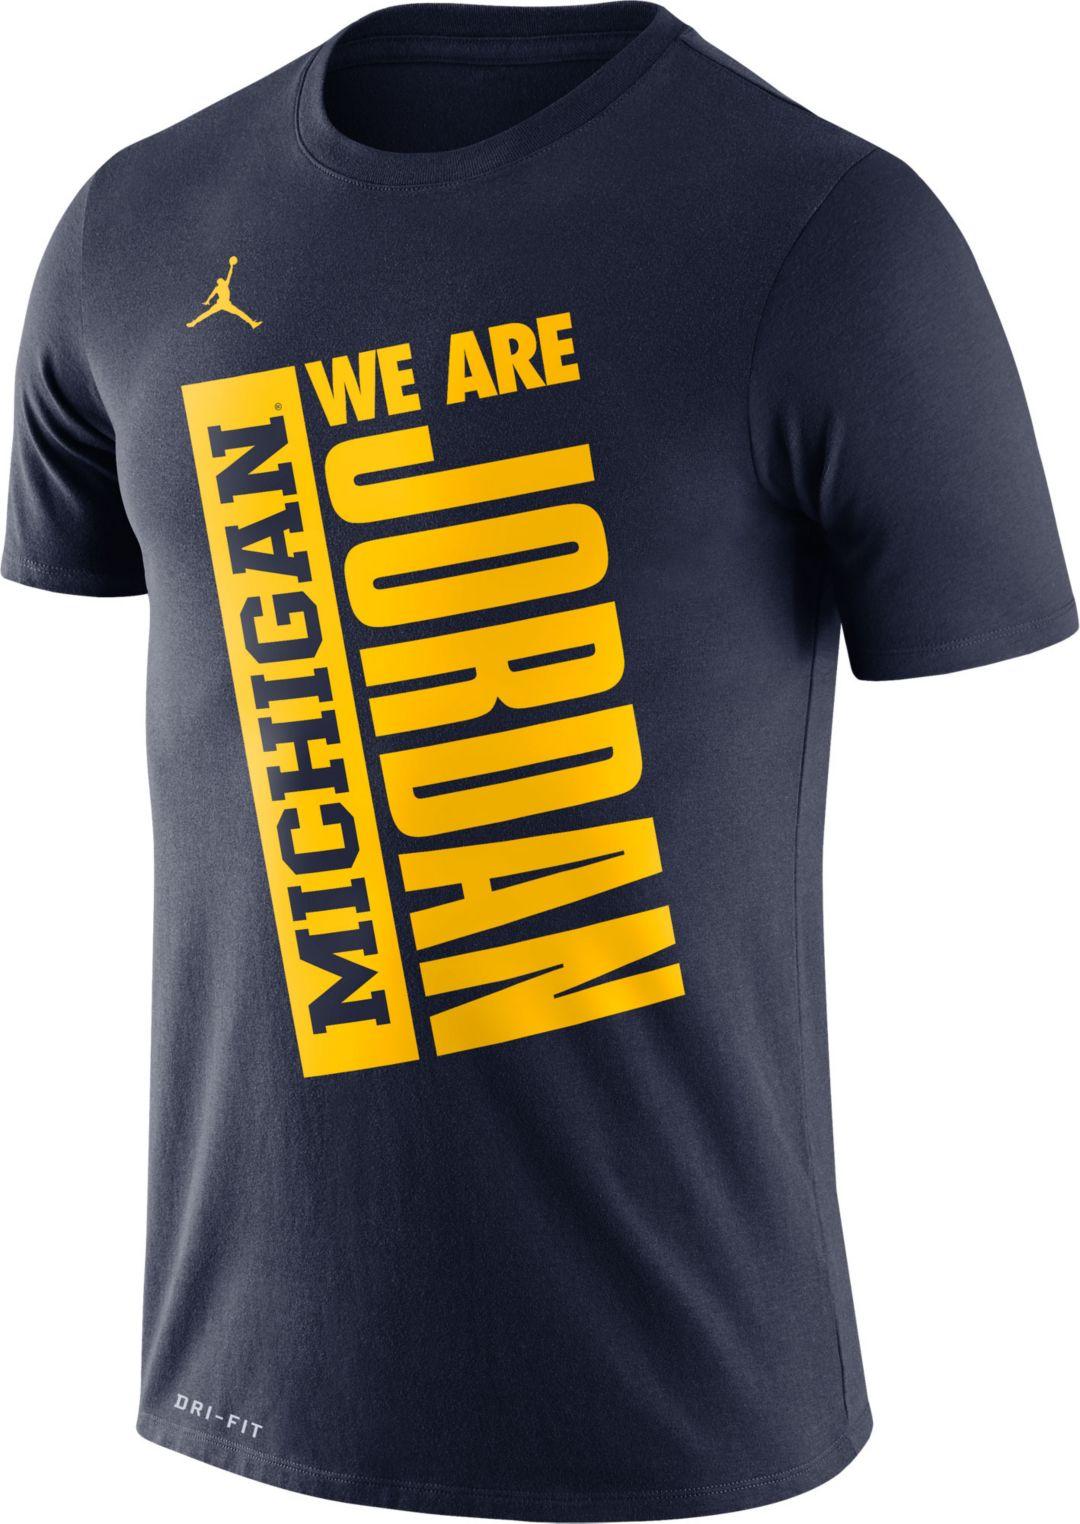 Michigan Jordan Gear >> Jordan Men S Michigan Wolverines Blue Dri Fit Performance Basketball T Shirt